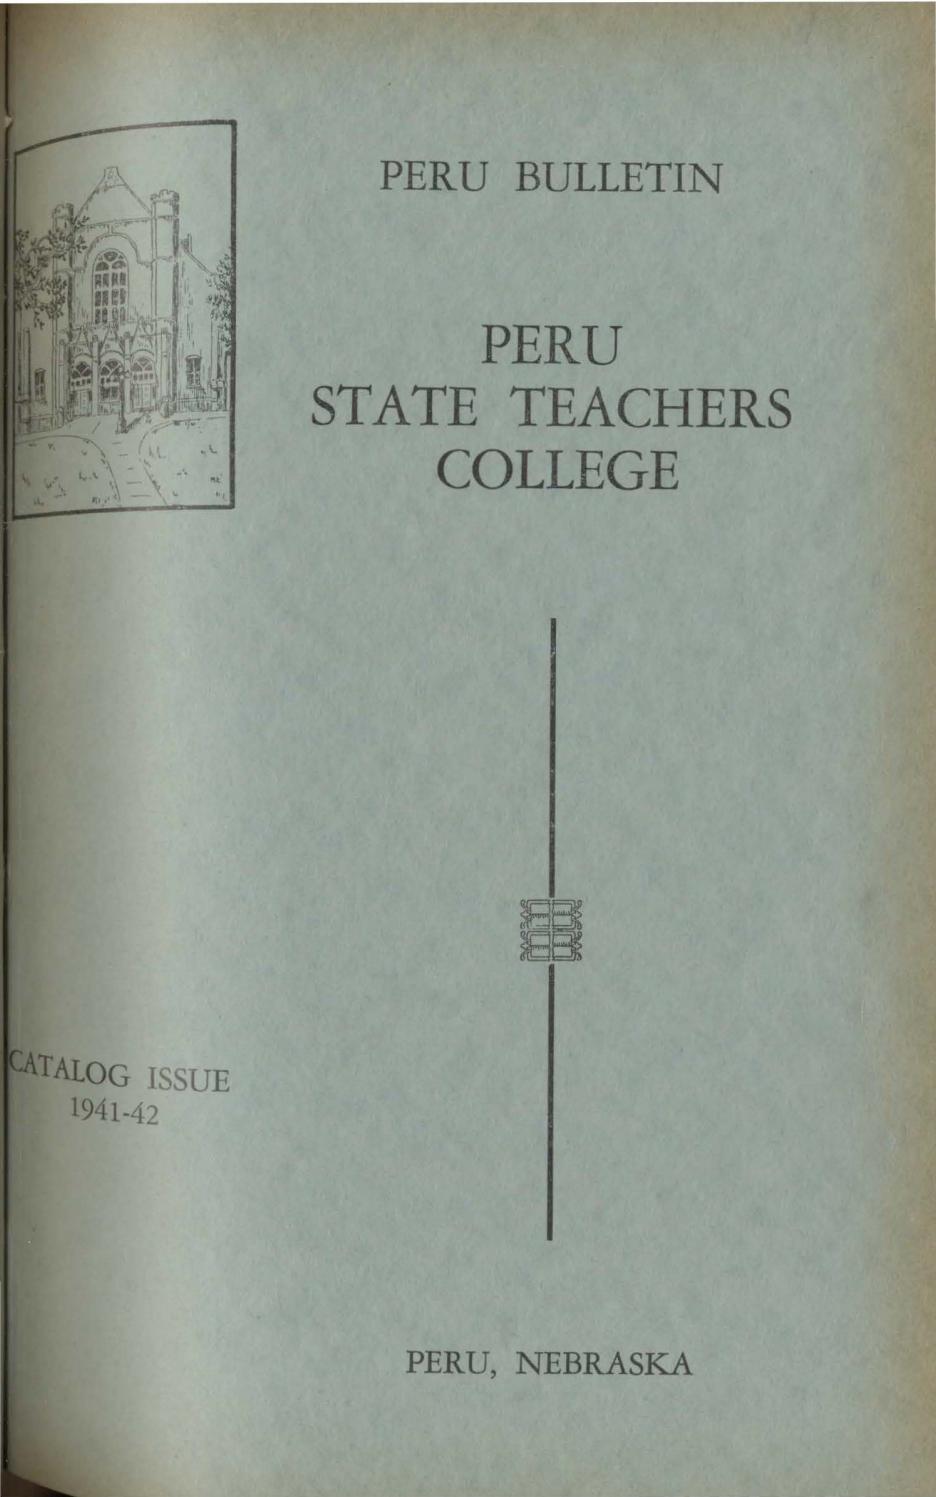 medium resolution of 1941 1942 catalog of peru state teachers college nebraska